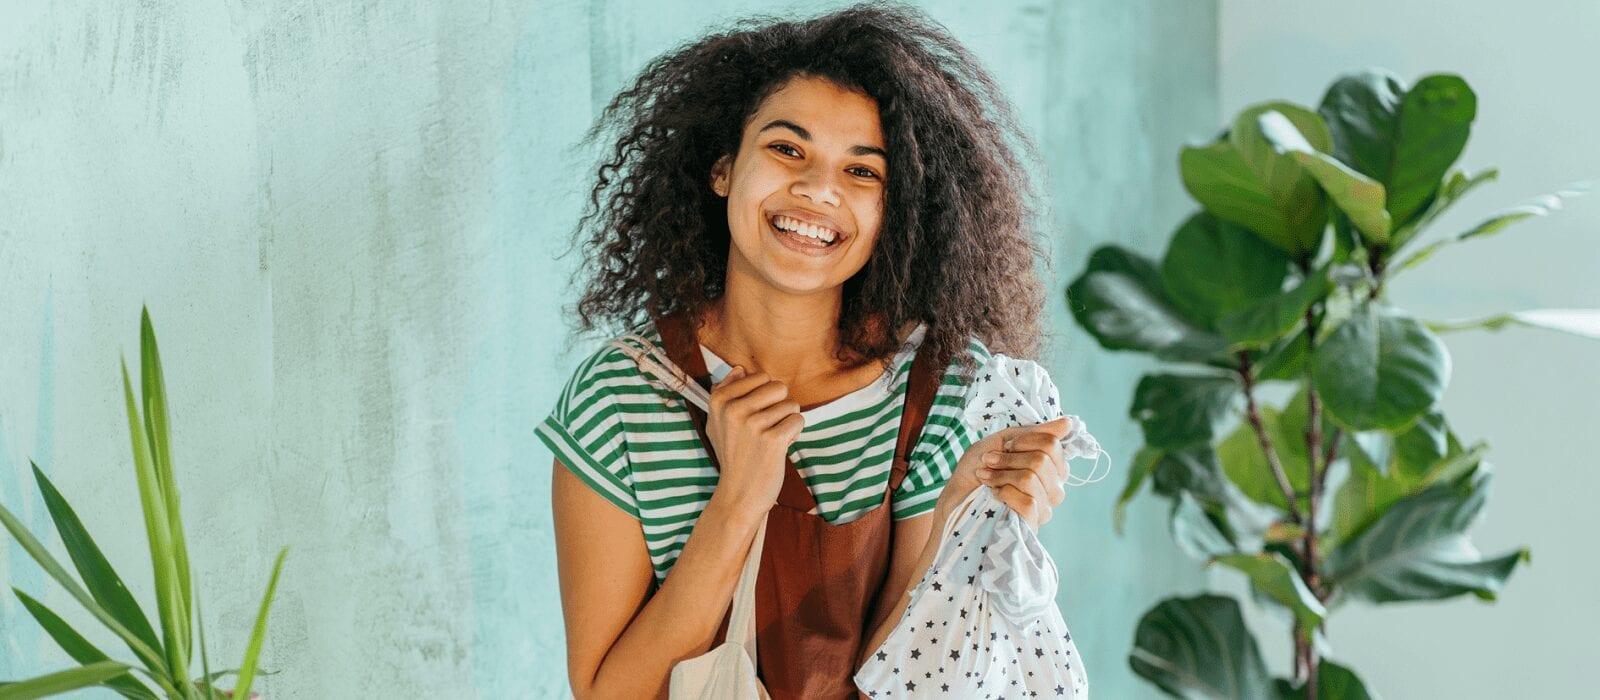 onefamily-young-consumer-enviro